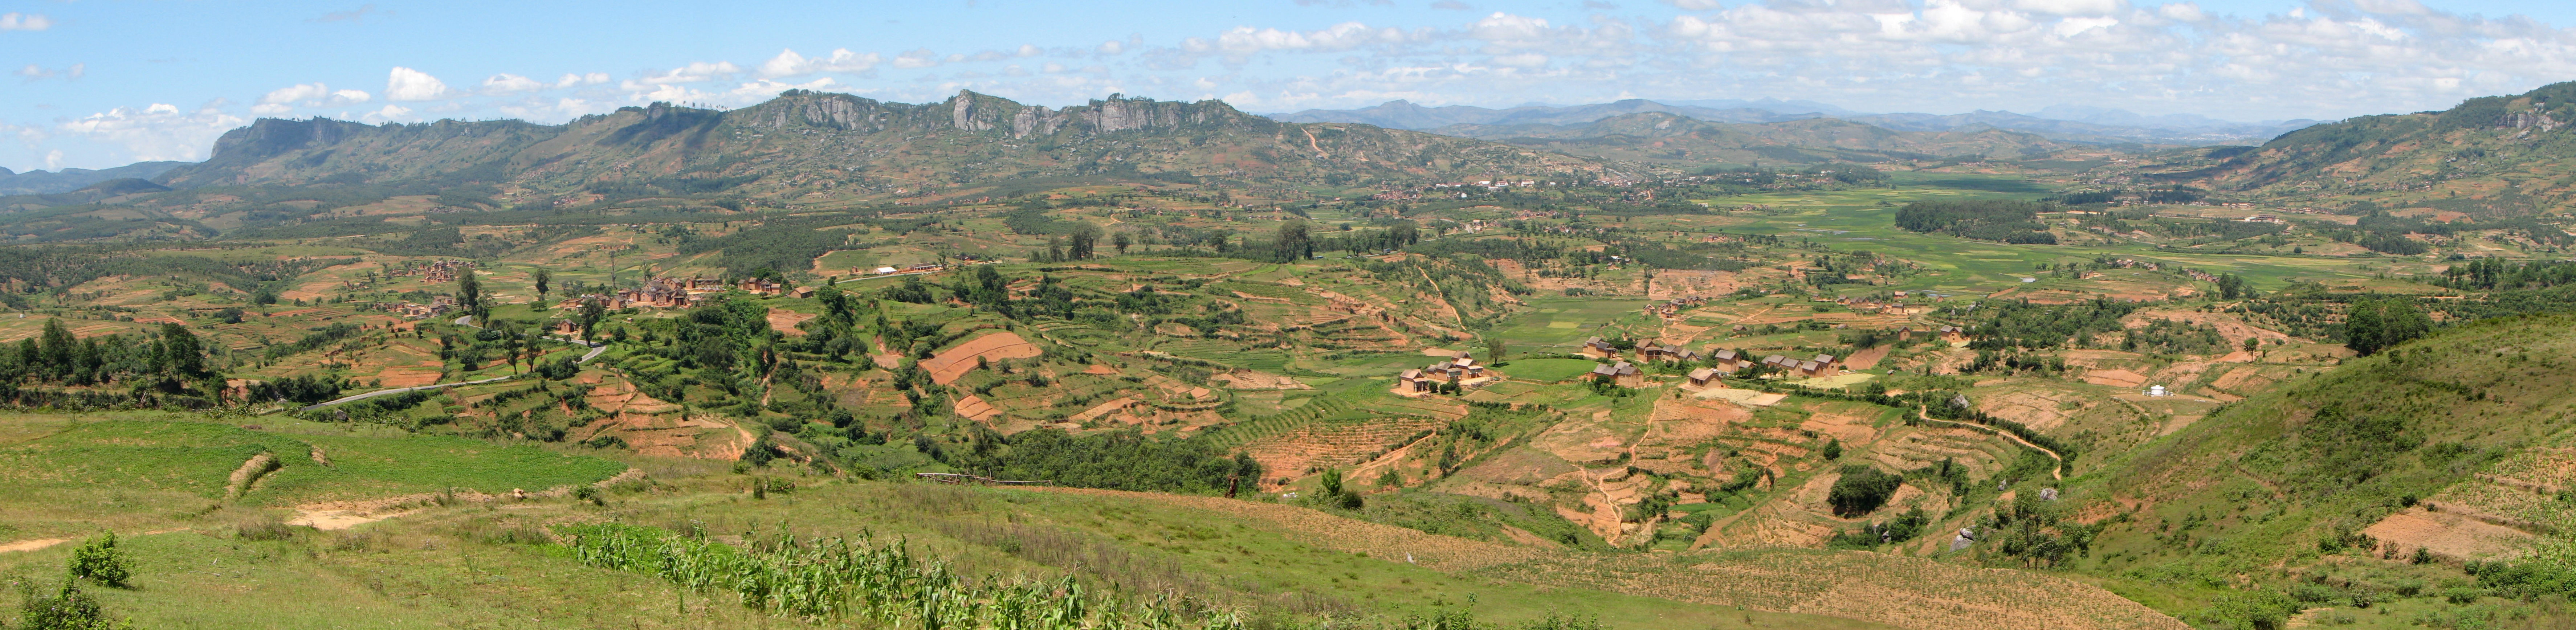 File:Landscape Madagascar 07.jpg - Wikimedia Commons